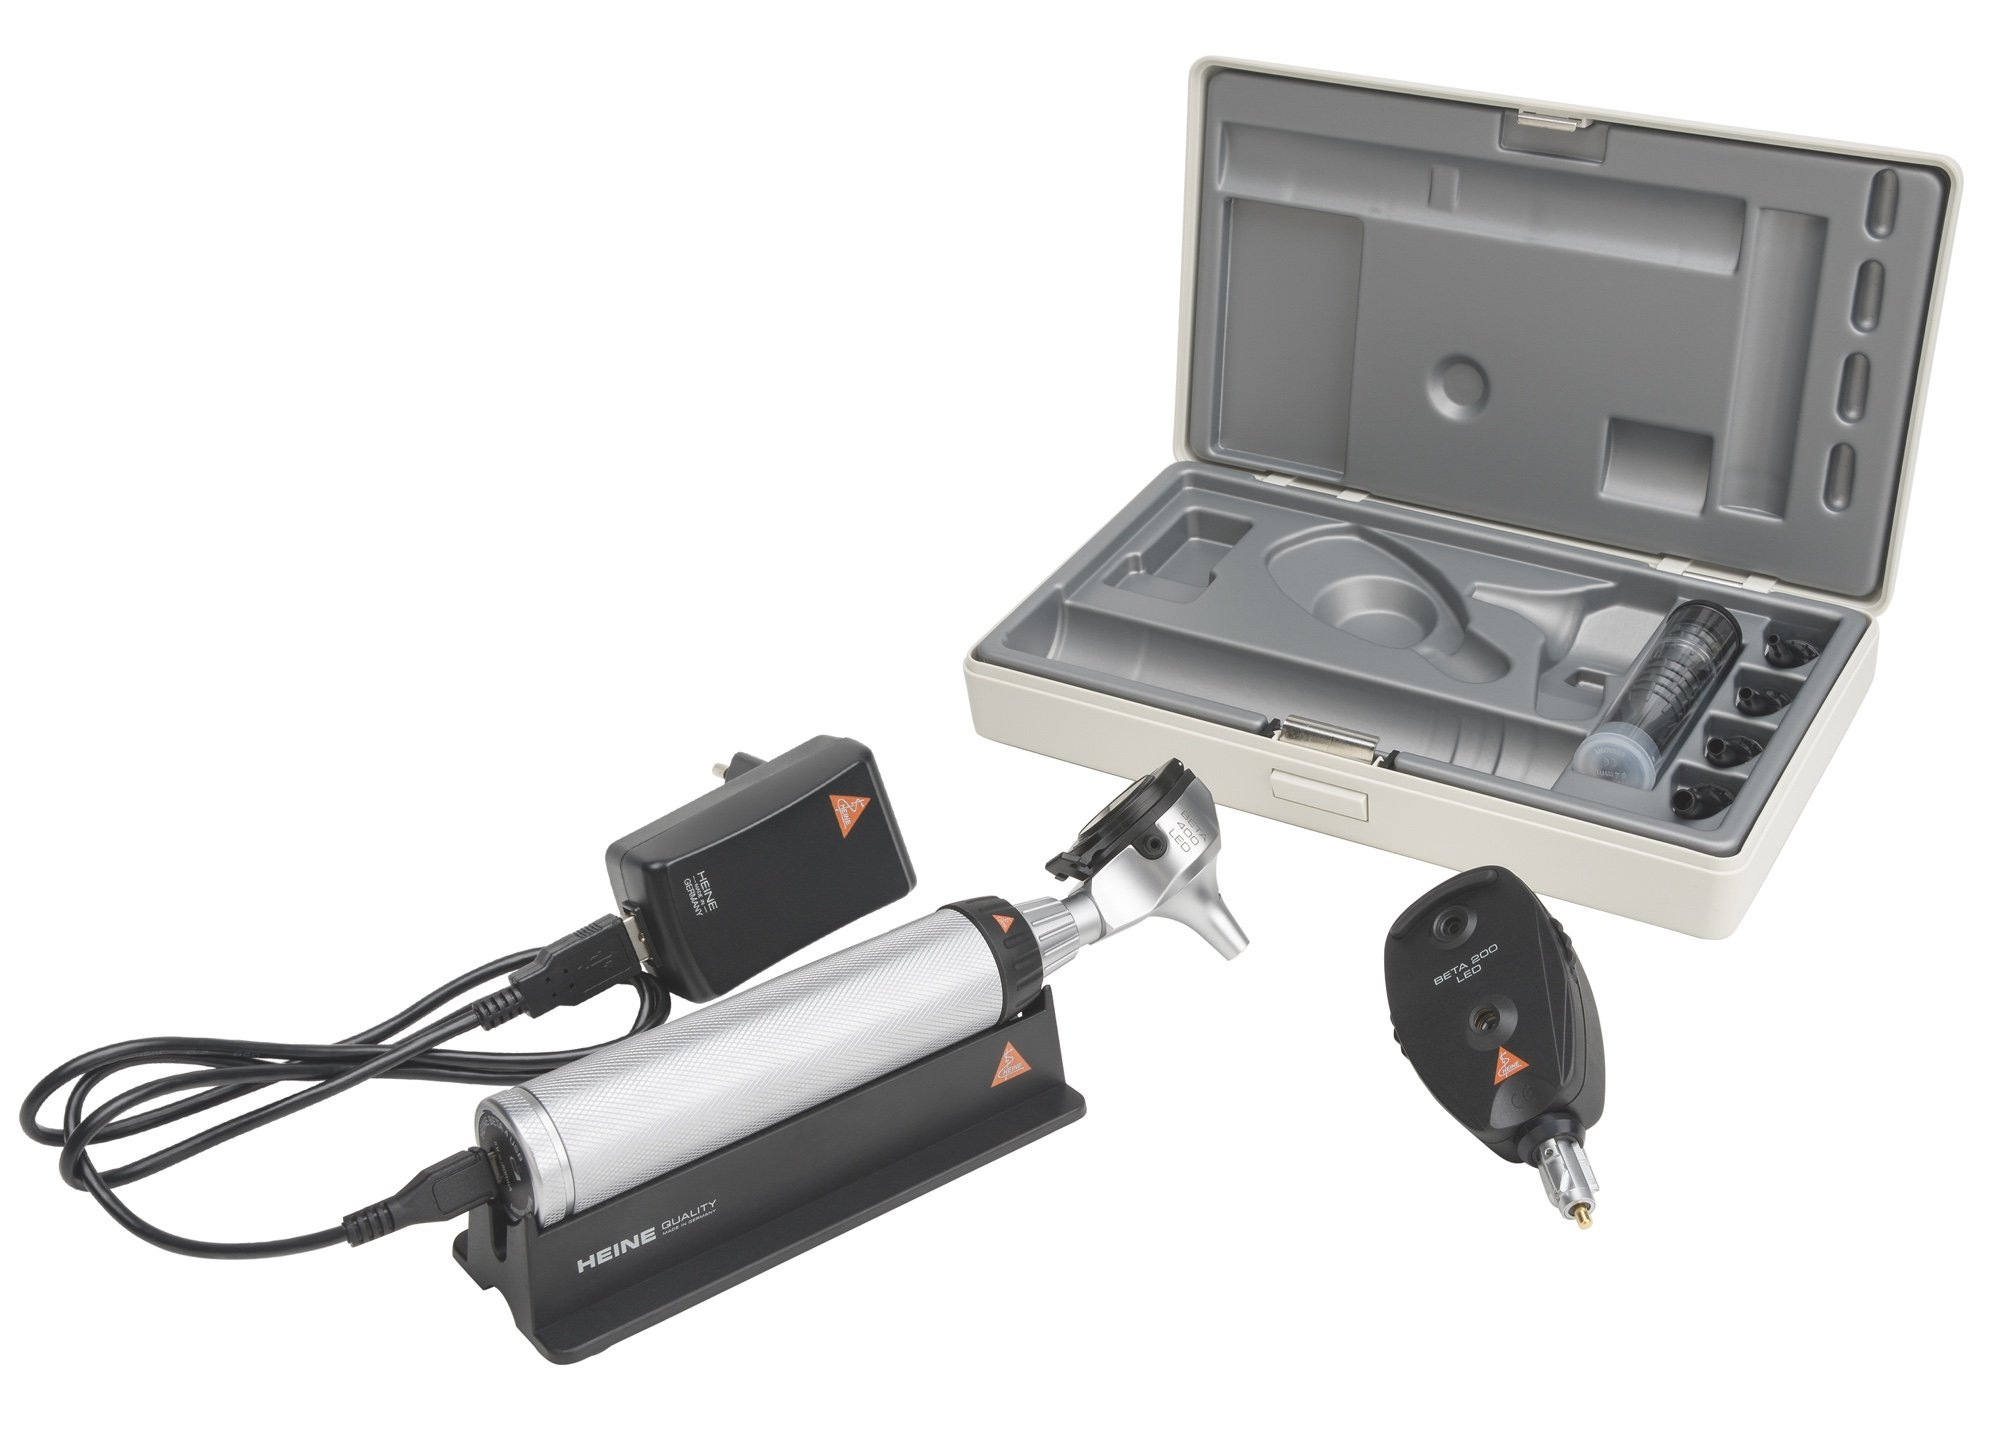 HEINE Diagnostic Set: BETA 400 LED Otoscope & BETA 200 Opthalmoscope (USB Rechargeable Handle)